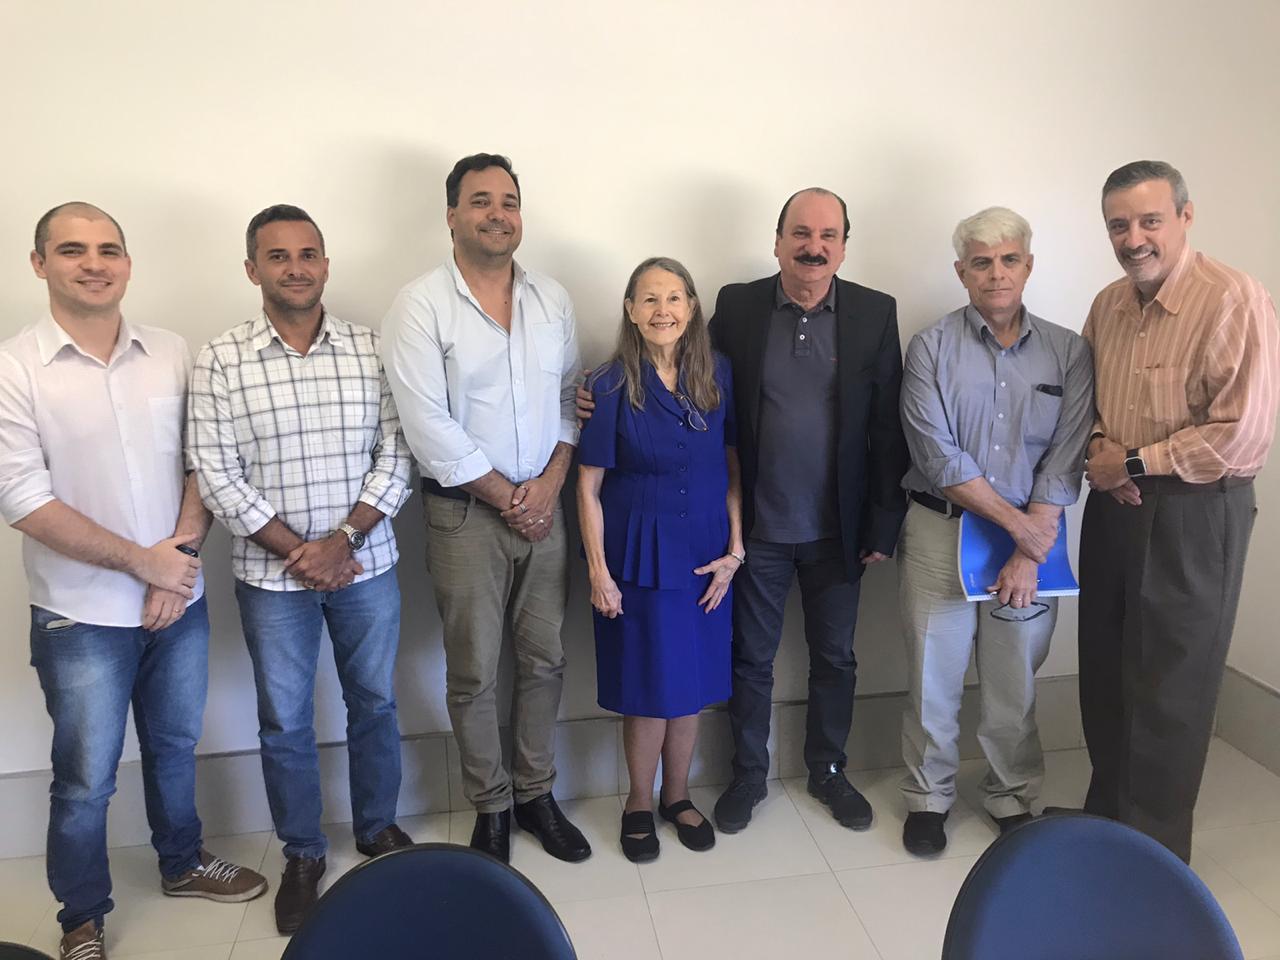 Comitiva americana visita Secitec - Comitiva americana visita Secitec para conhecer o ecossistema de tecnologia do município